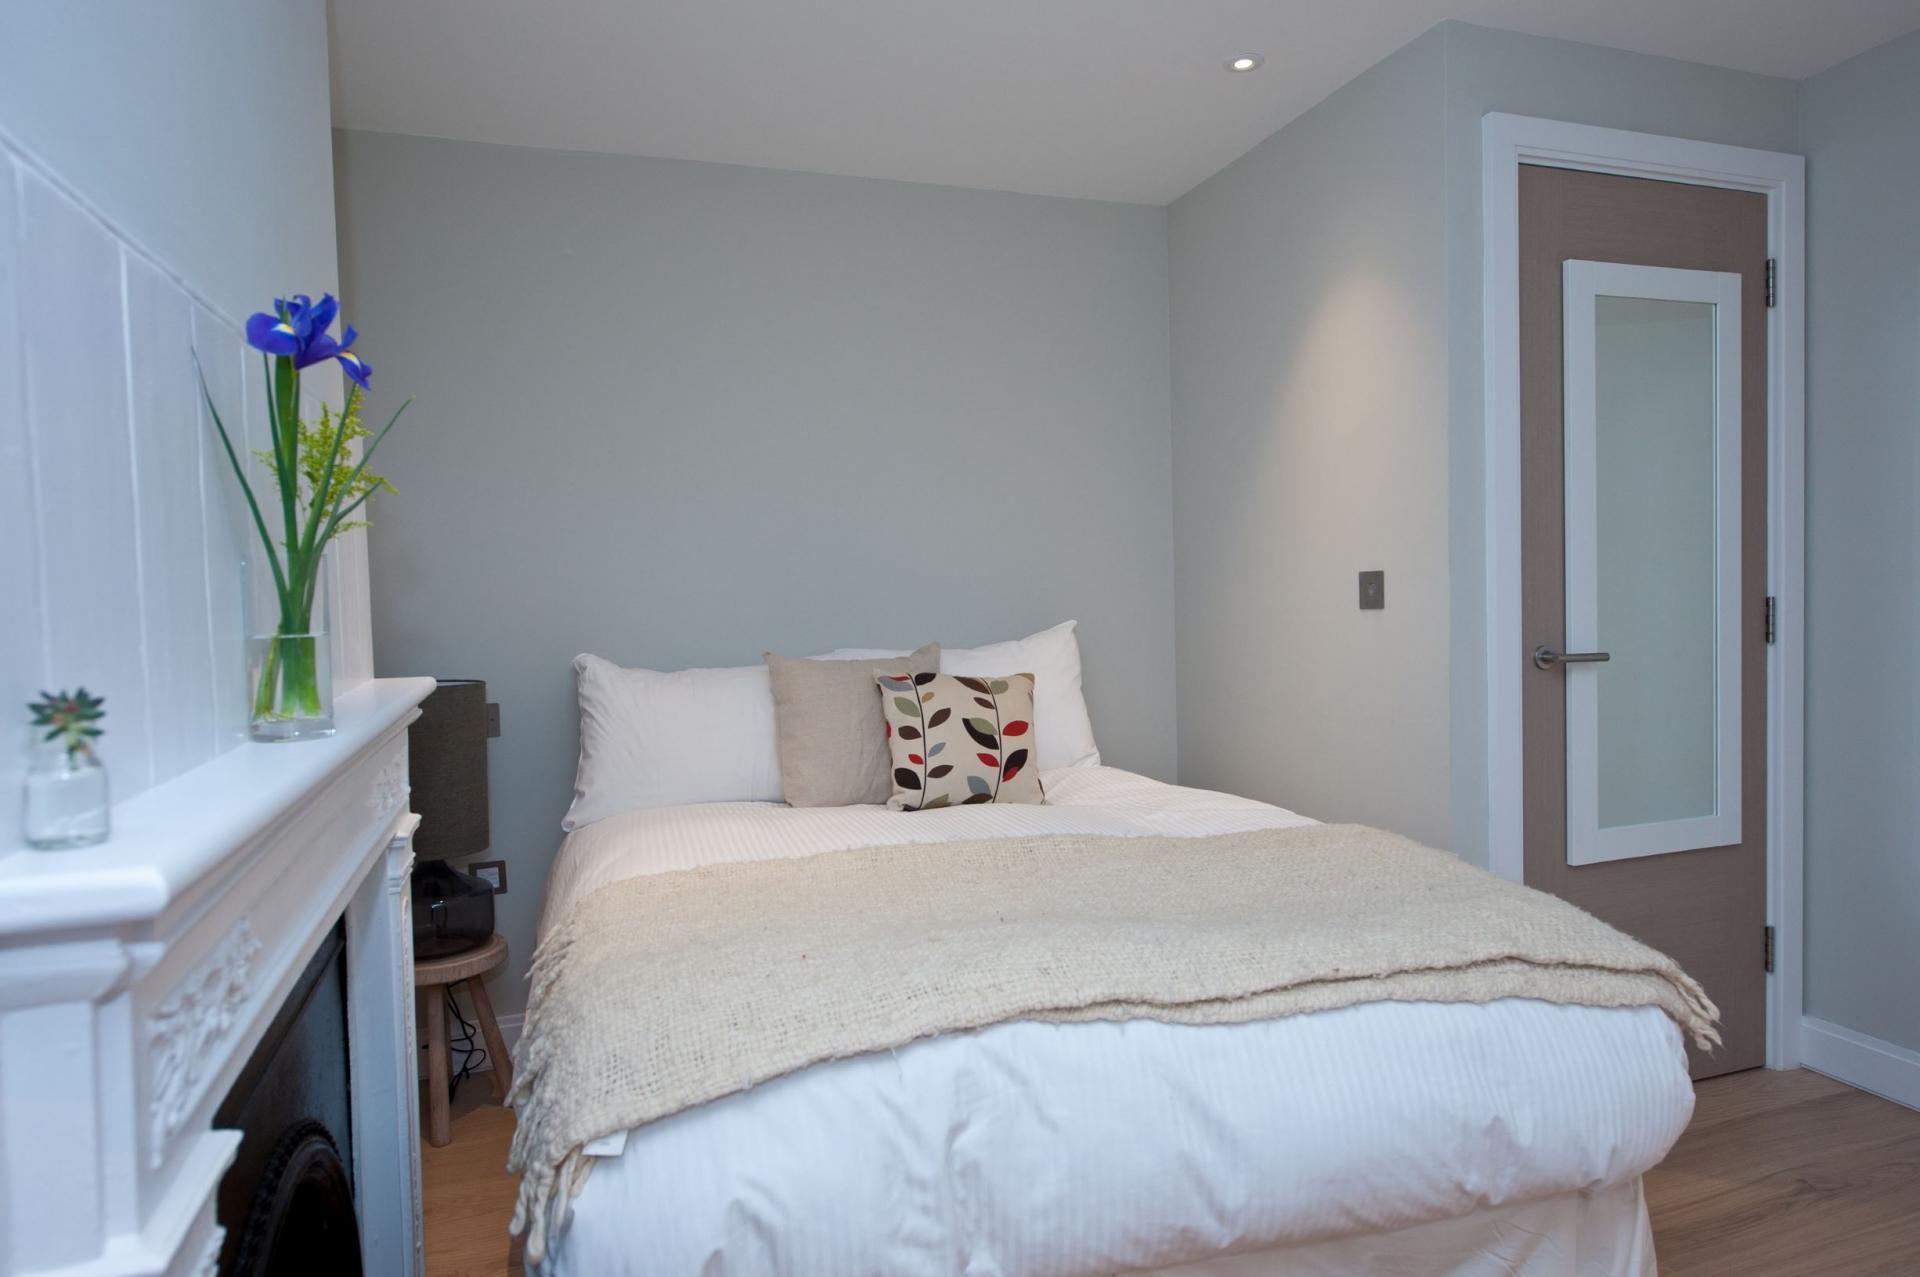 White bed linen at Spitalfields Hanbury Apartment - Citybase Apartments